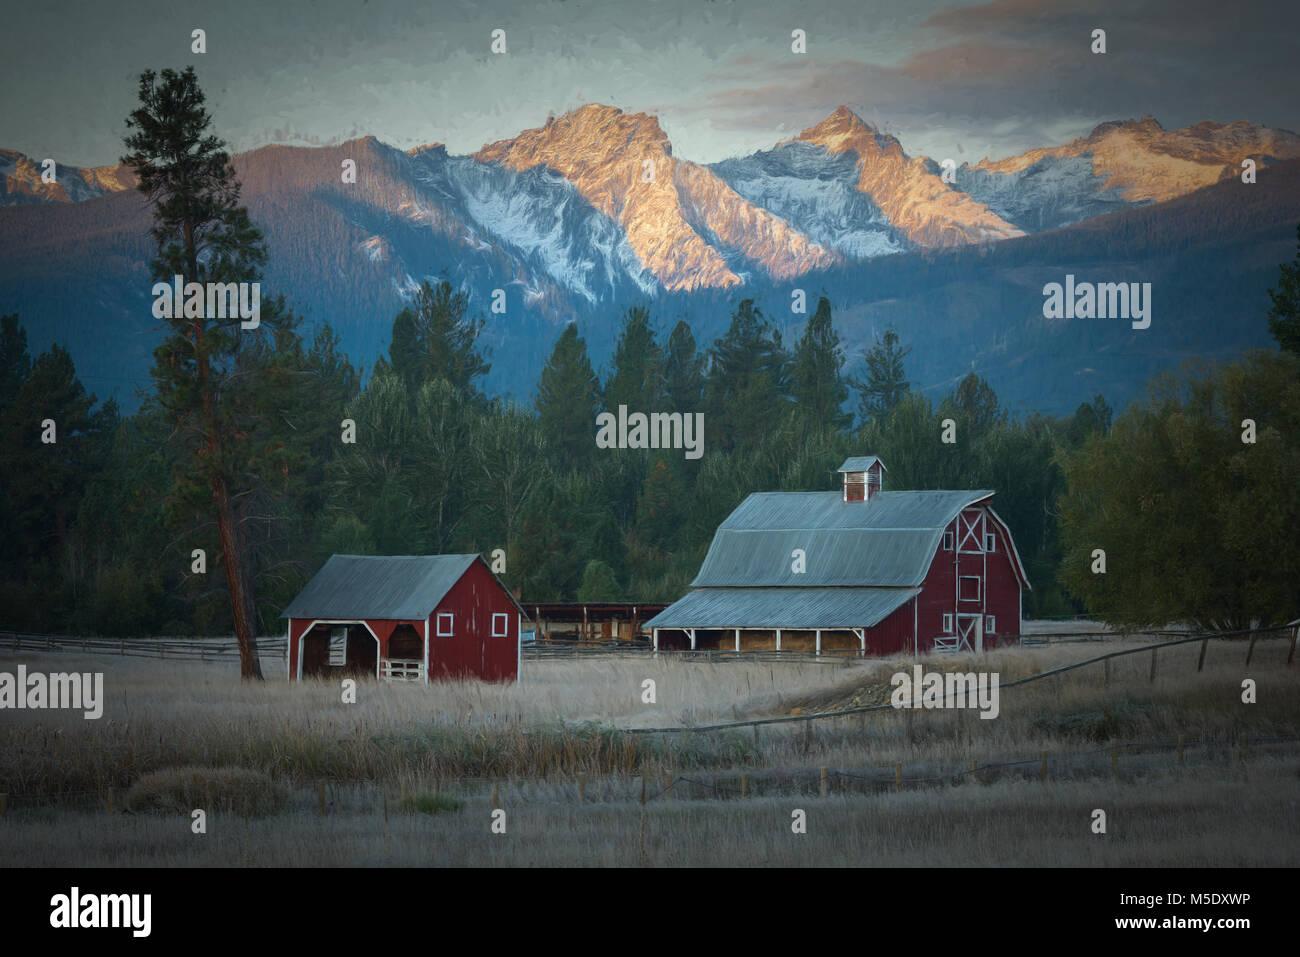 Nordamerika, Rocky Mountains, Montana, Bitteroot Tal, Bauernhof bei Sonnenaufgang Stockbild